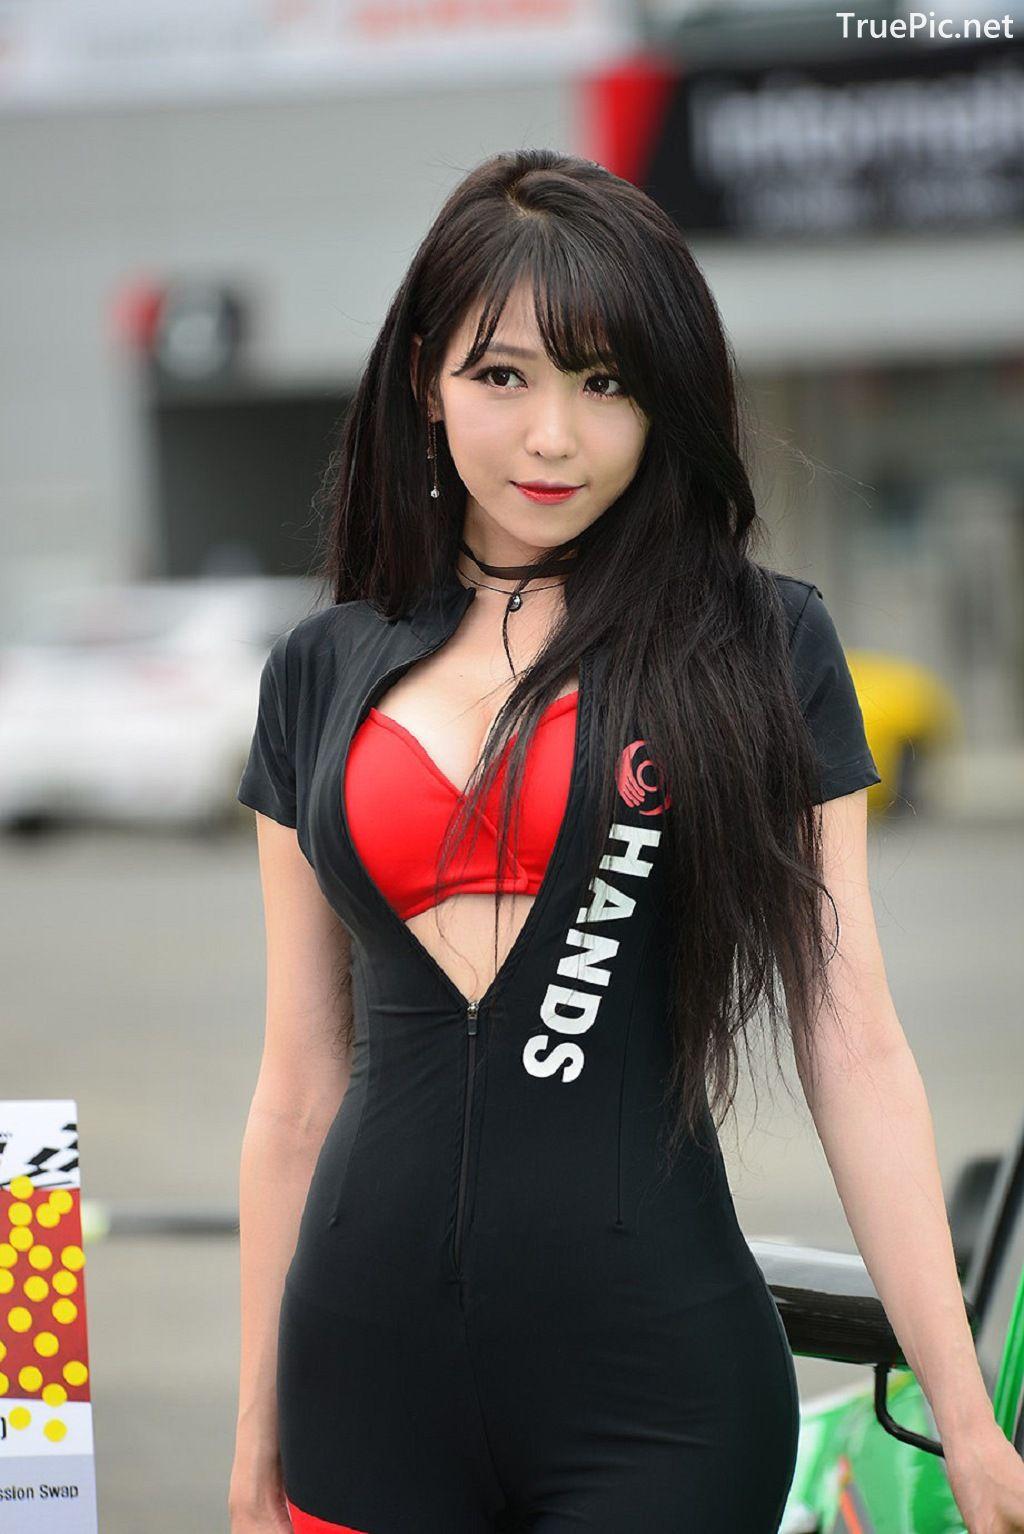 Image-Korean-Racing-Model-Lee-Eun-Hye-At-Incheon-Korea-Tuning-Festival-TruePic.net- Picture-10